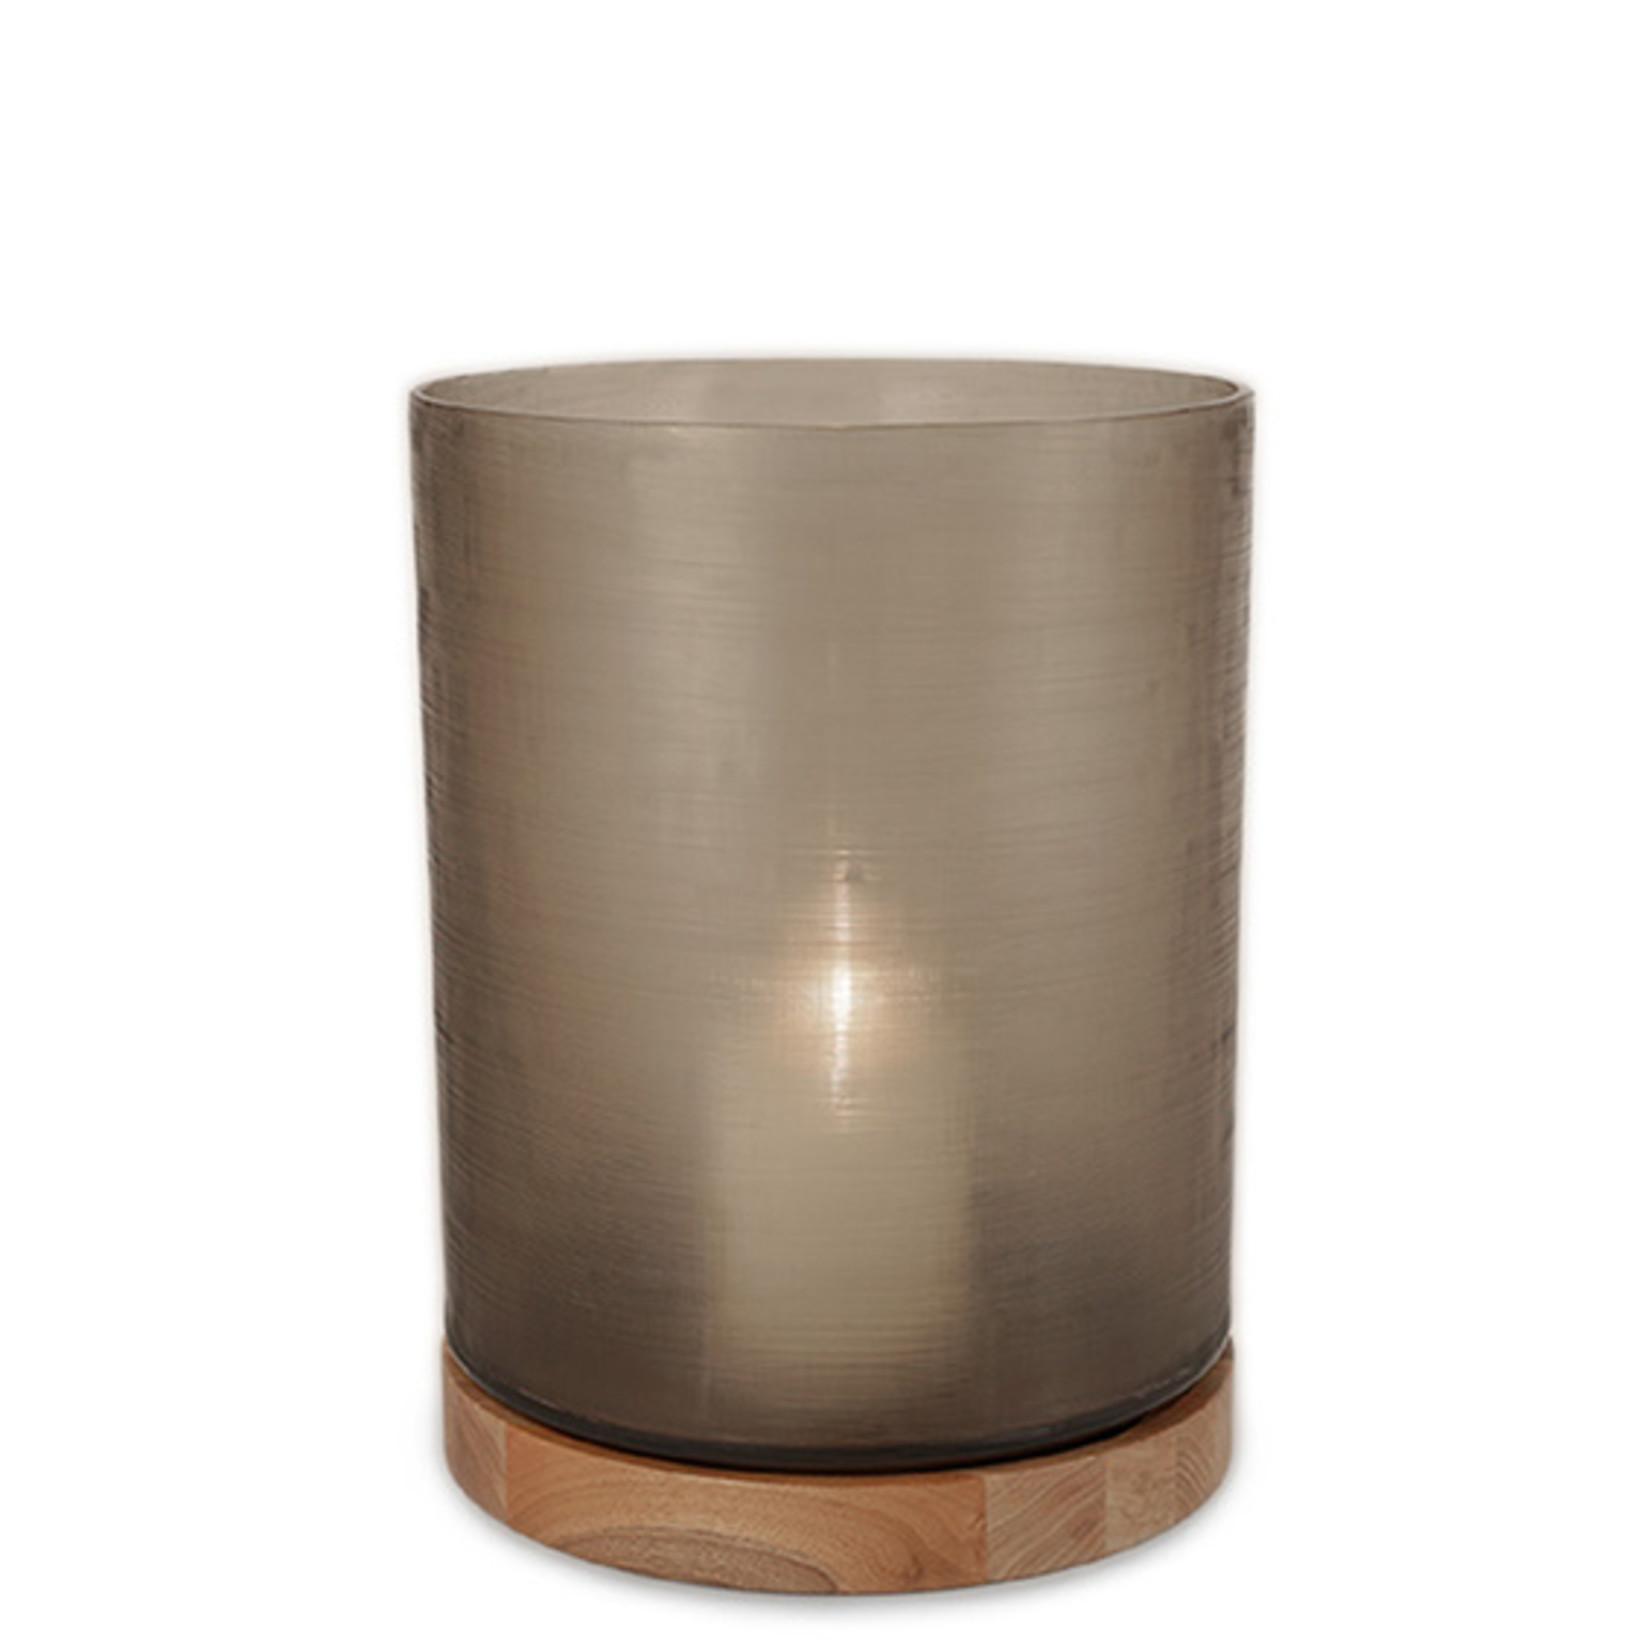 Guaxs Lantern Aran XL | Walnut / Smokegrey